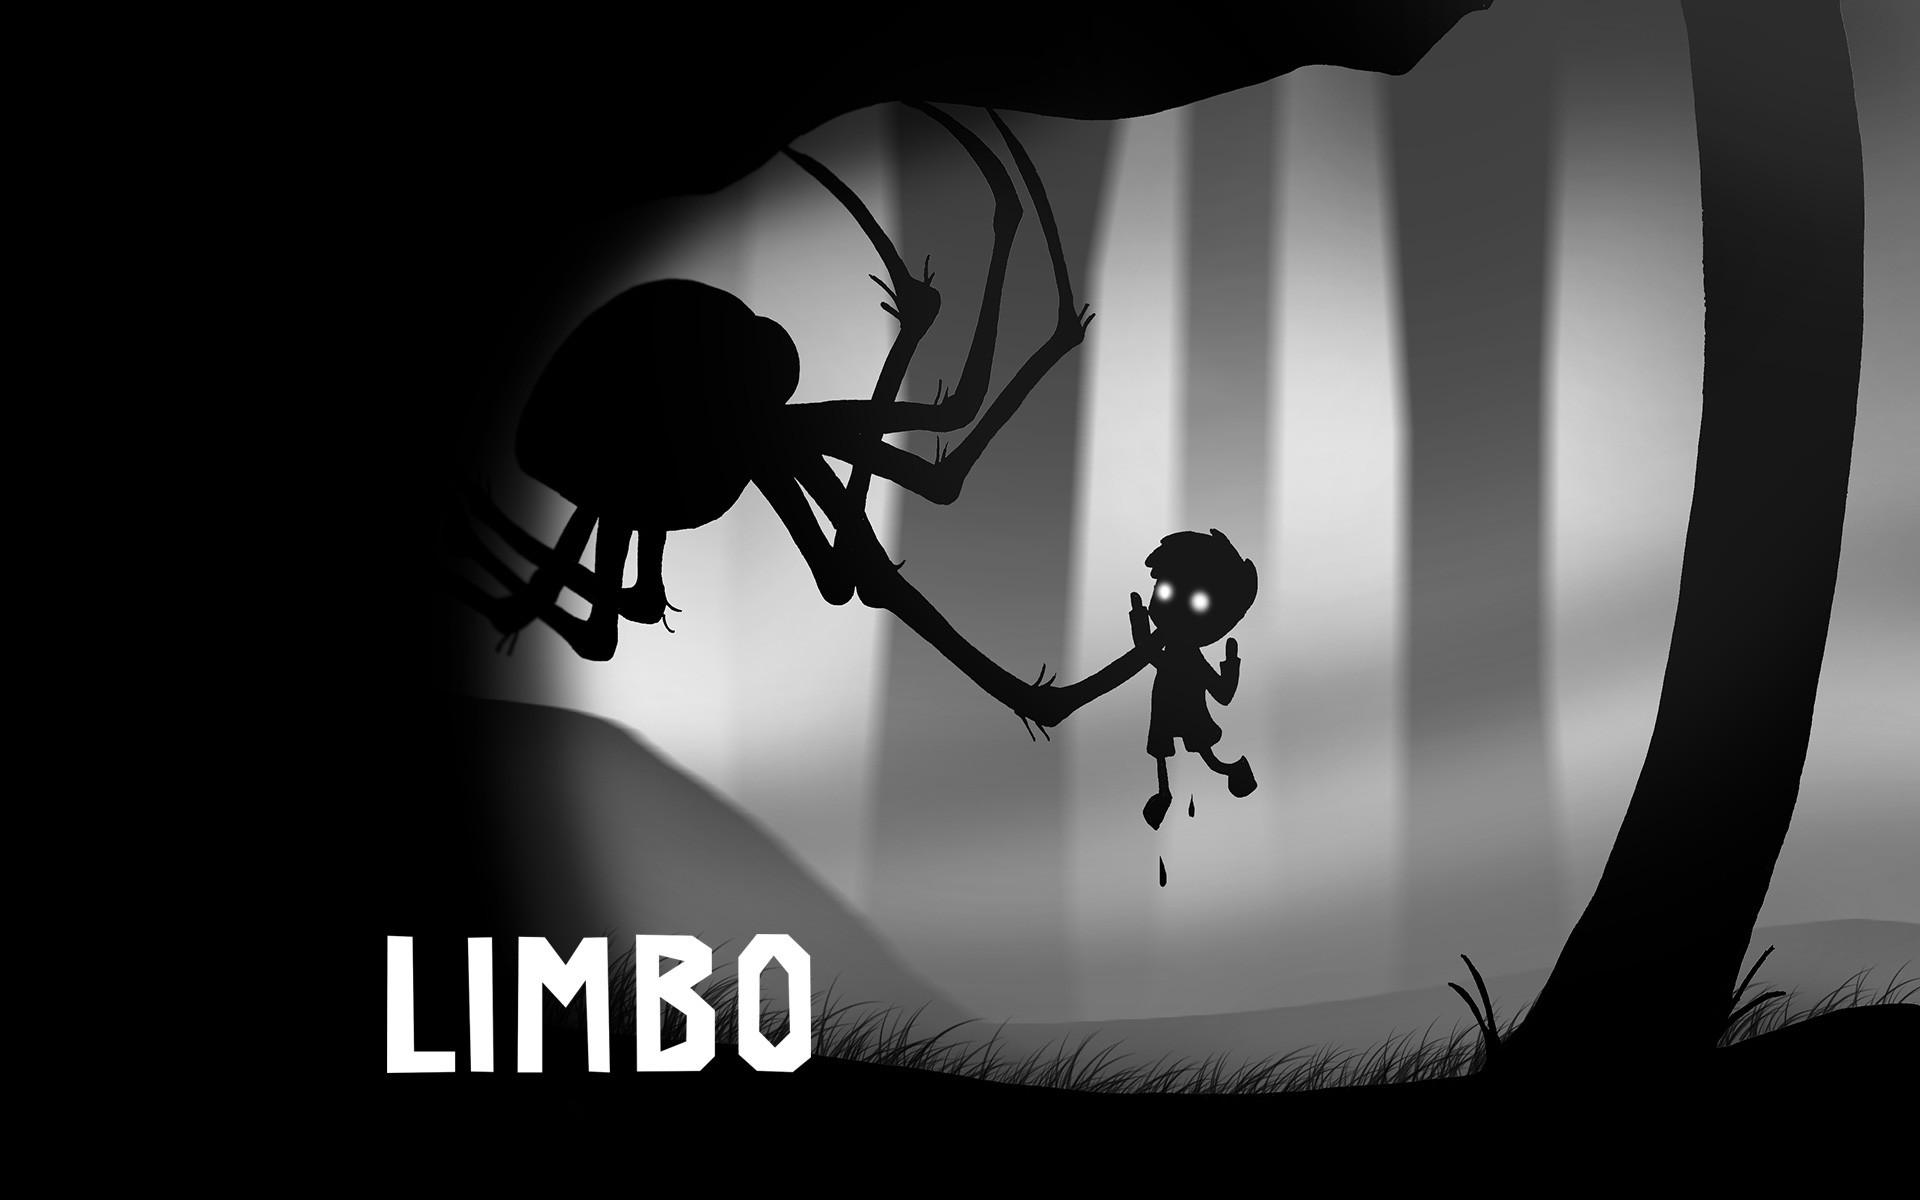 Limbo Wallpaper Hd 73 Images